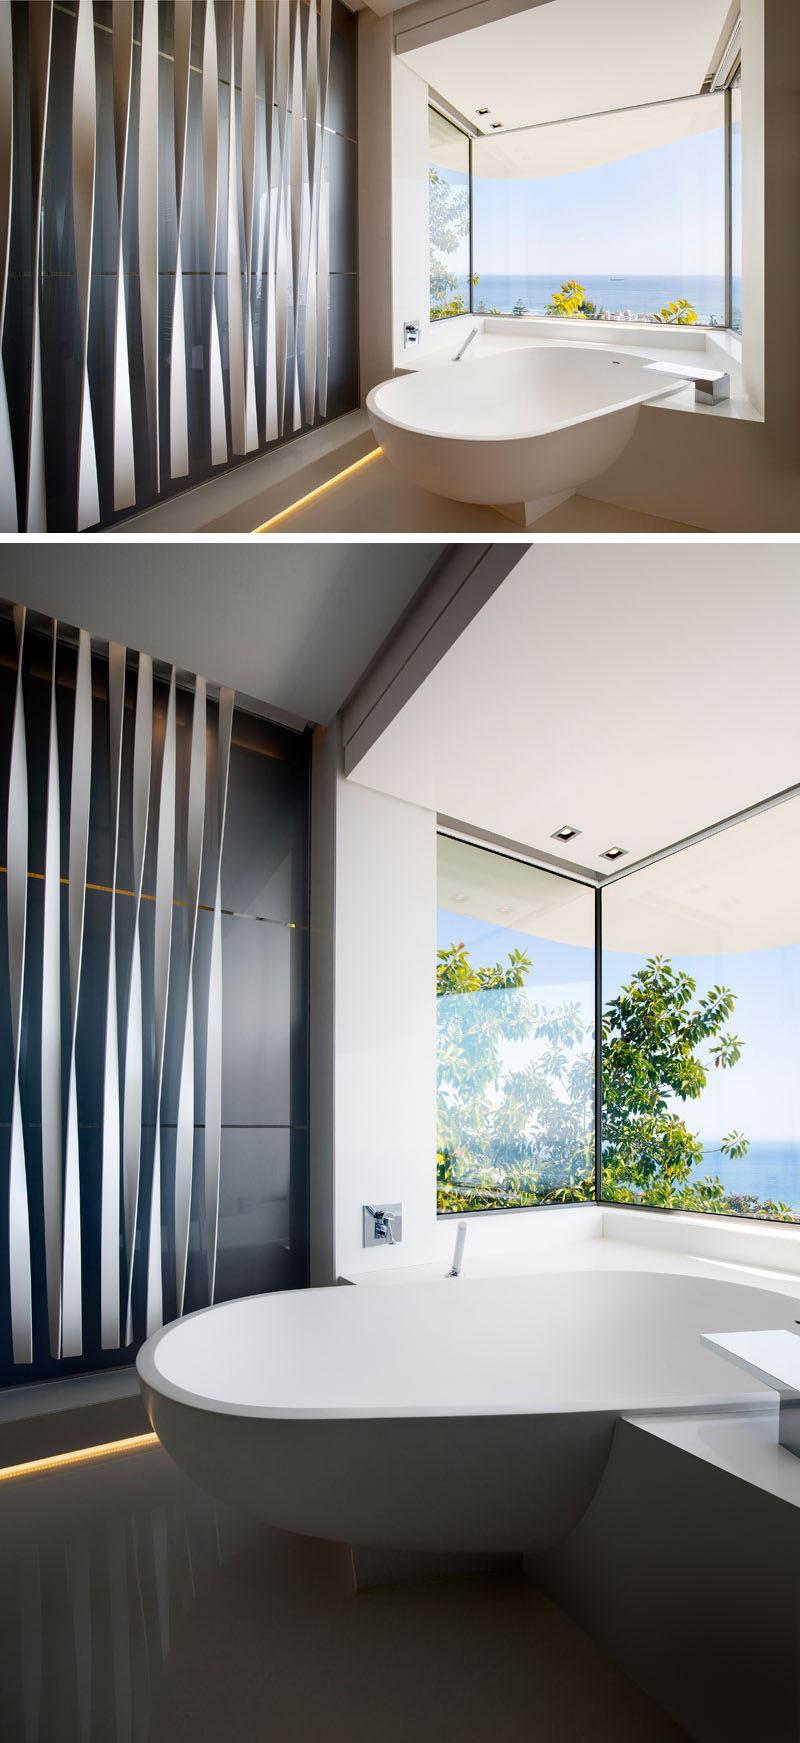 The master en-suite bathroom has been designed to strategically place a built-in bath tub that projects forward and allows 180 degree views over the ocean. #BuiltInBathtub #ModernBathroom #Windows #ModernBathtub